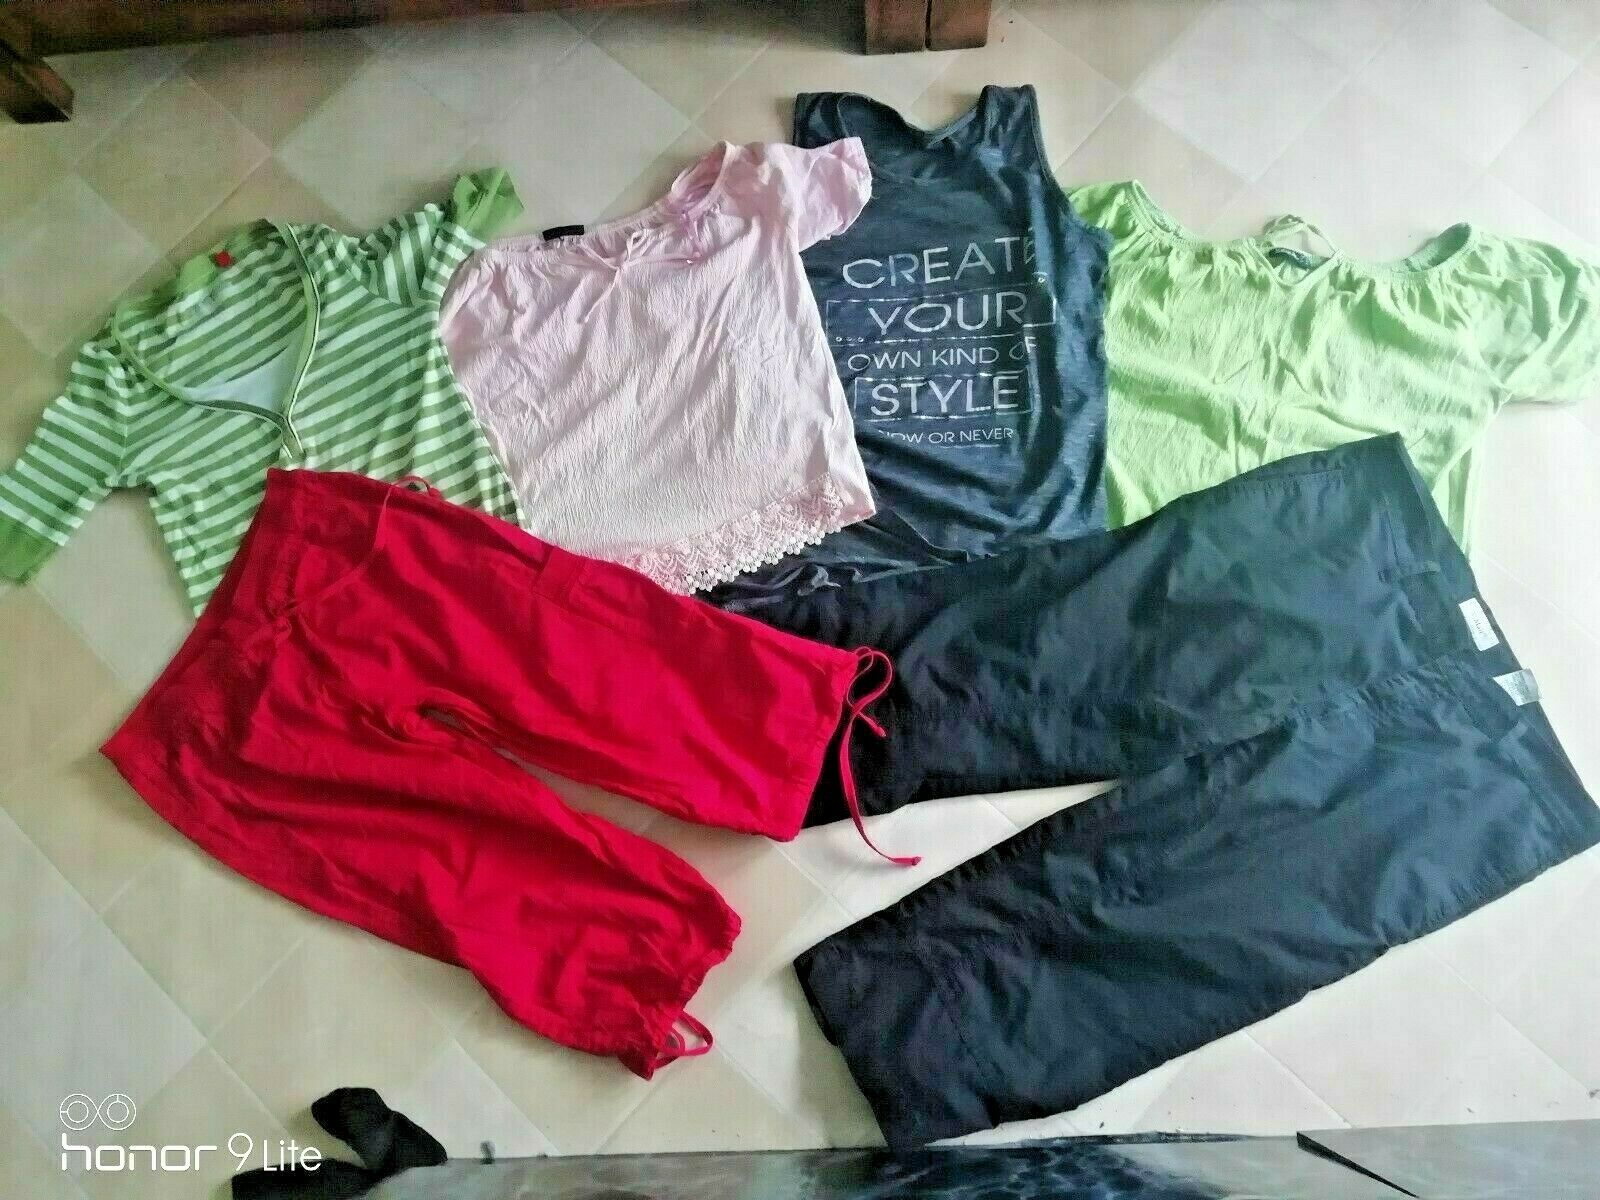 10teil Set Gr 40/42 Neue graue Jeans +Bermuda + Shirts